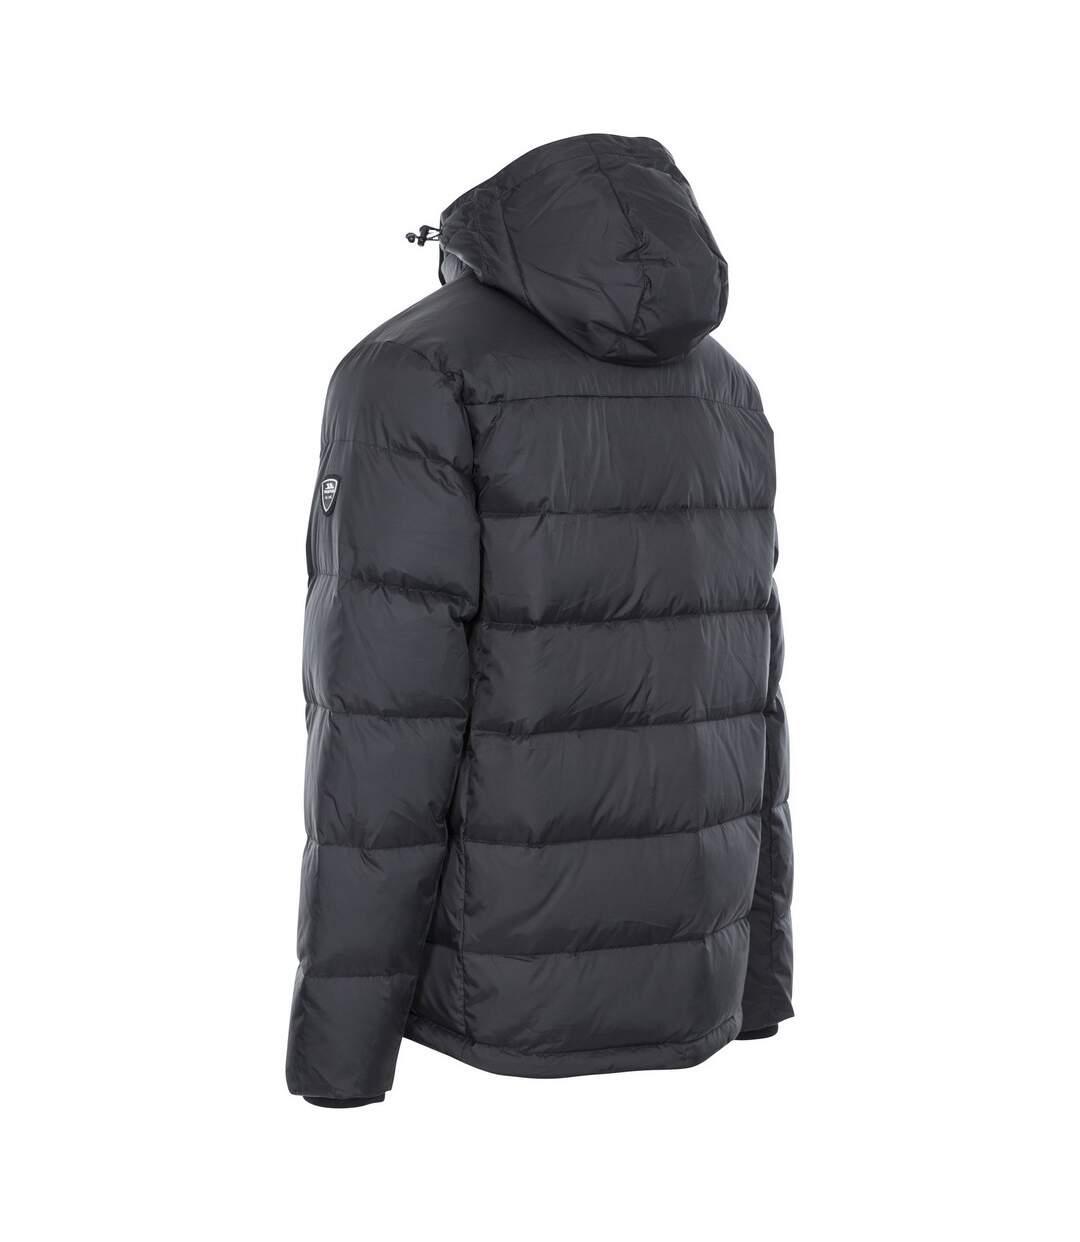 Trespass Mens Orwell Down Jacket (Black) - UTTP4815